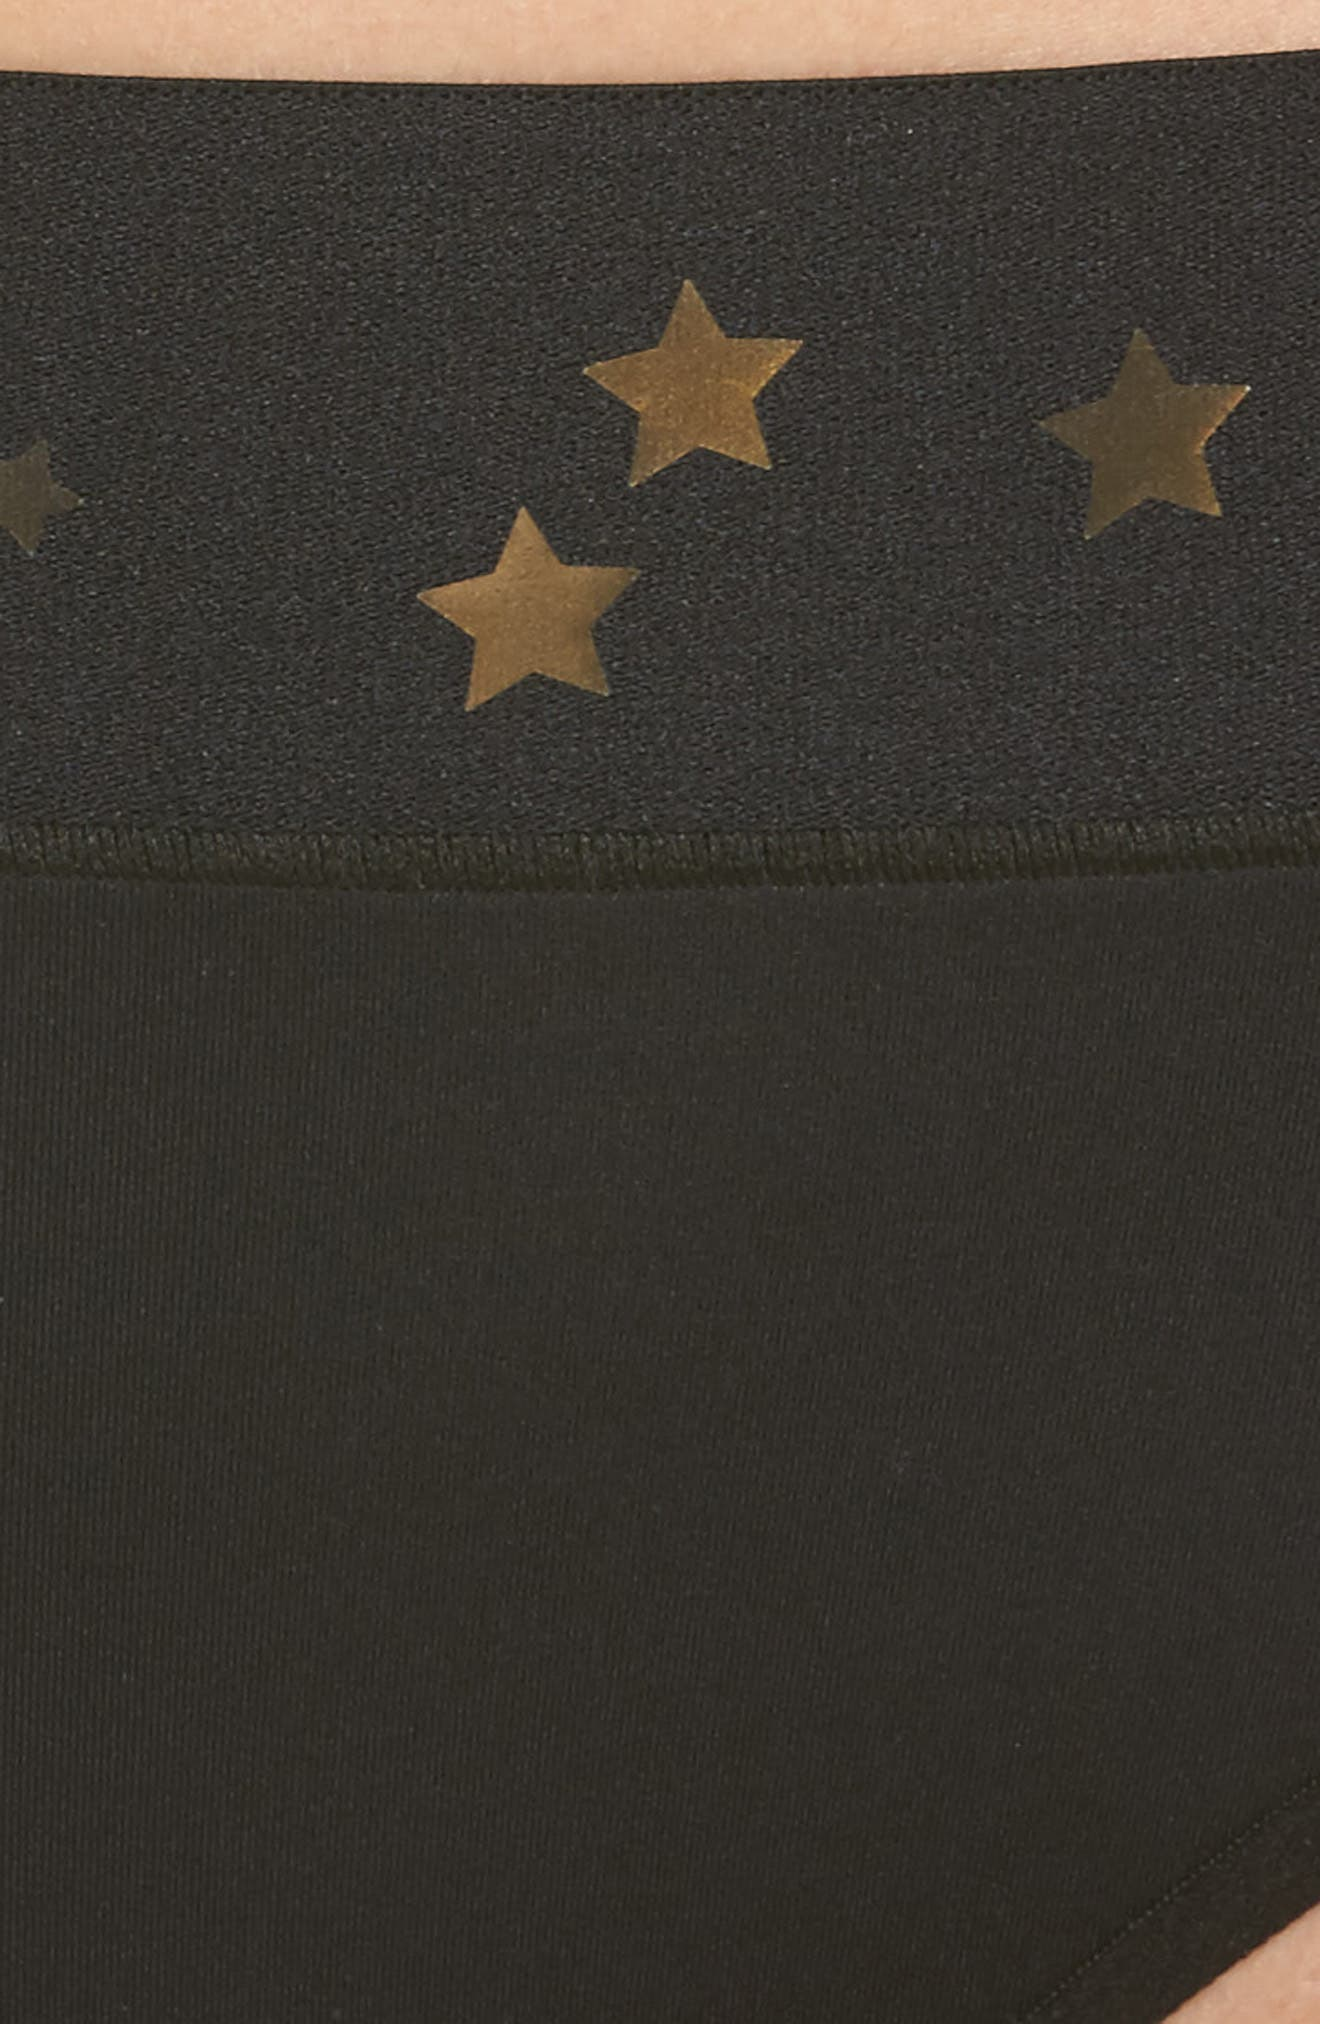 Argon Stellar High Waist Bikini Bottoms,                             Alternate thumbnail 8, color,                             Nero/ Iridecsent Gold